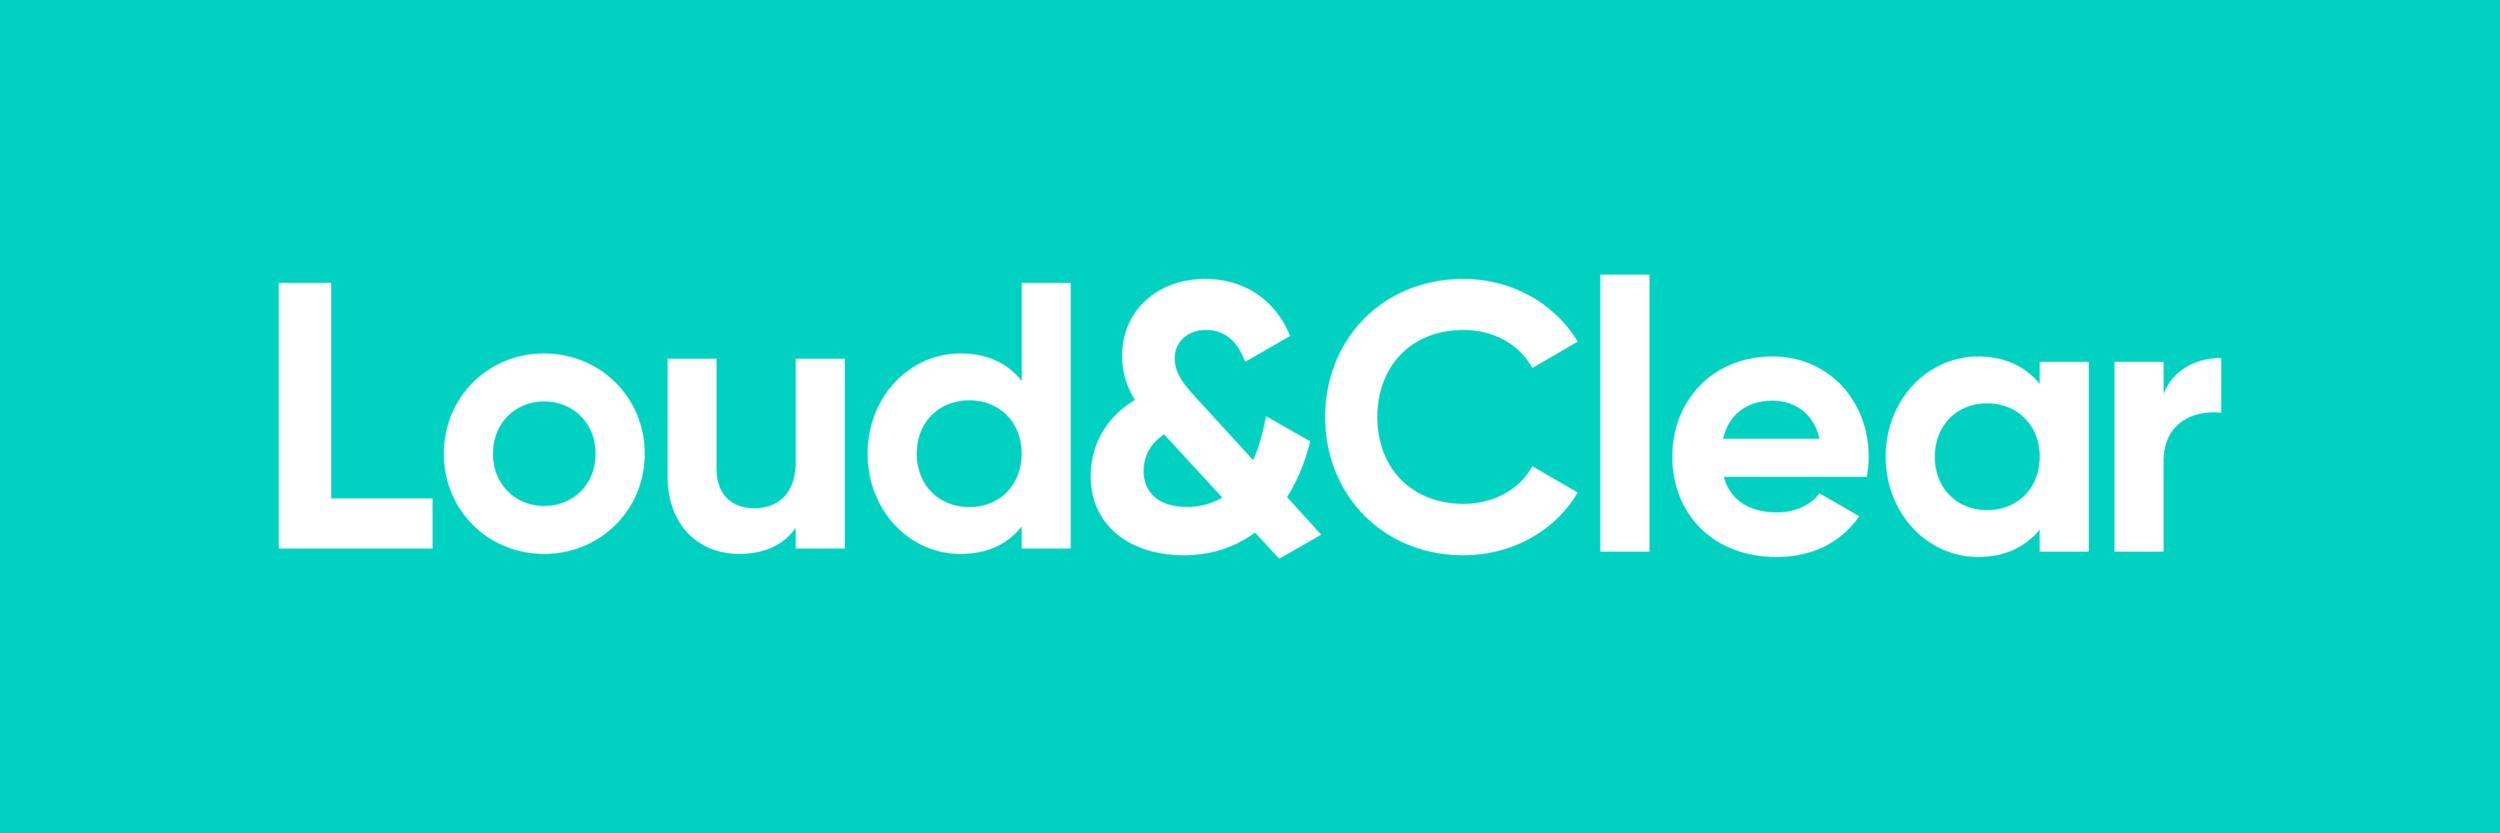 Loud & Clear logo.png